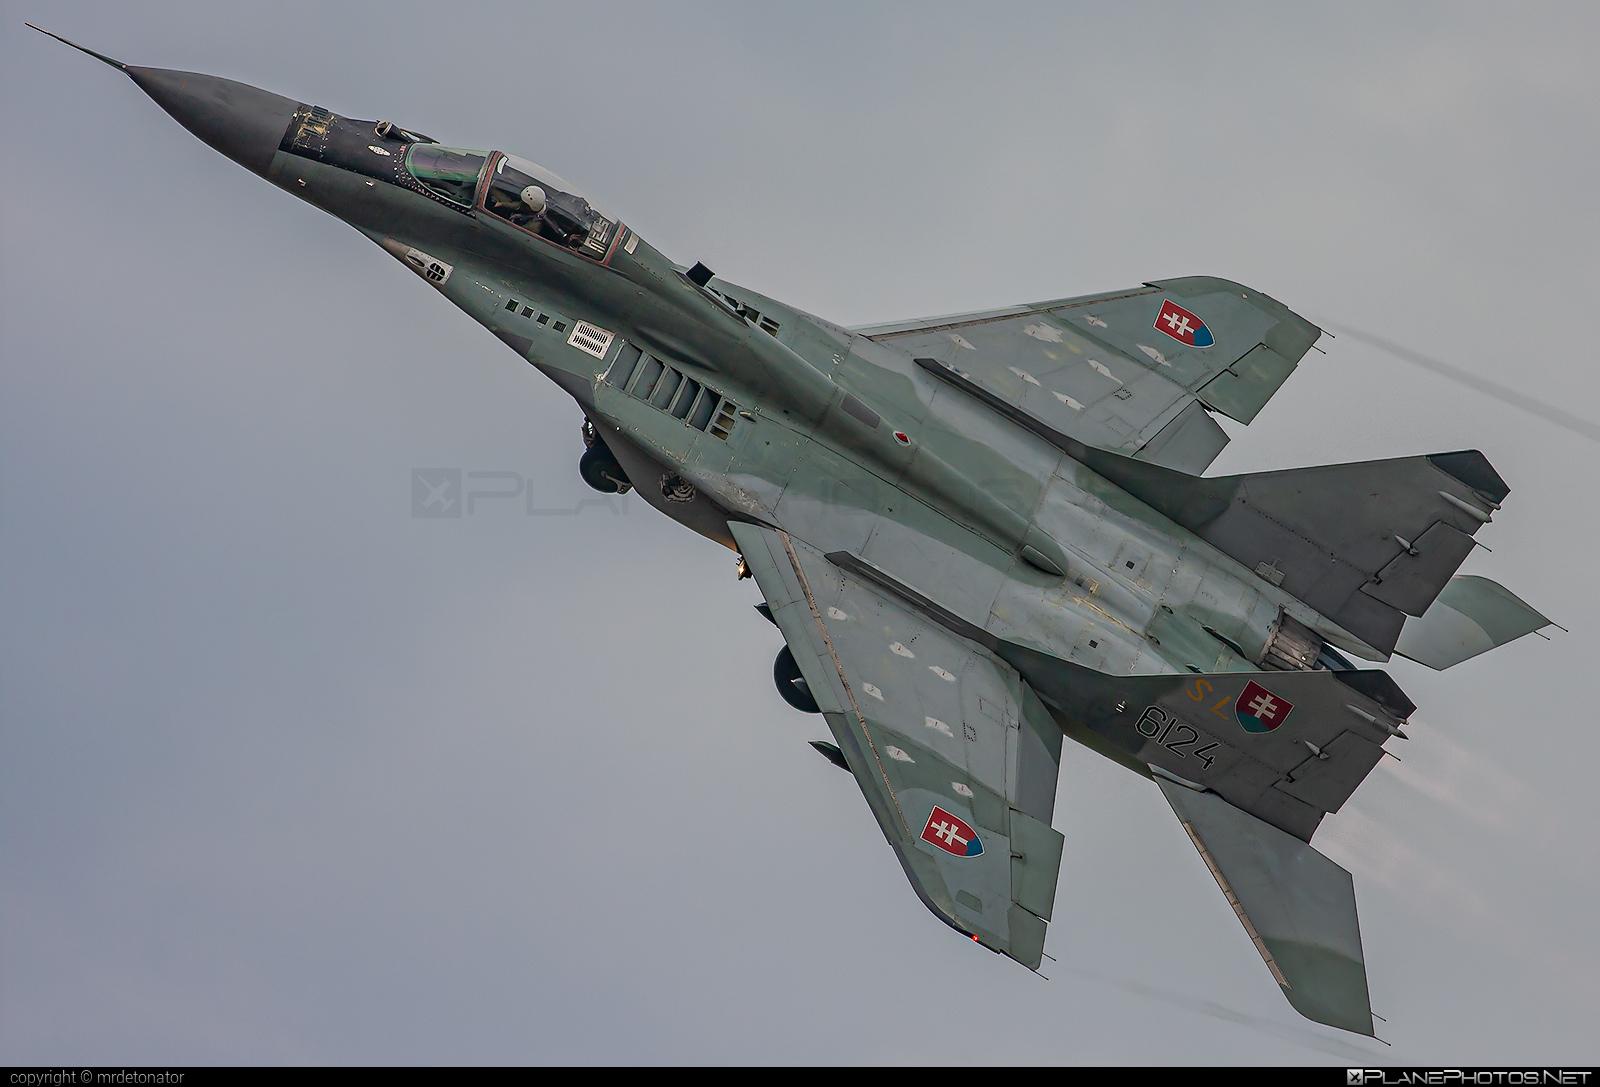 Mikoyan-Gurevich MiG-29AS - 6124 operated by Vzdušné sily OS SR (Slovak Air Force) #mig #mig29 #mig29as #mikoyangurevich #slovakairforce #vzdusnesilyossr